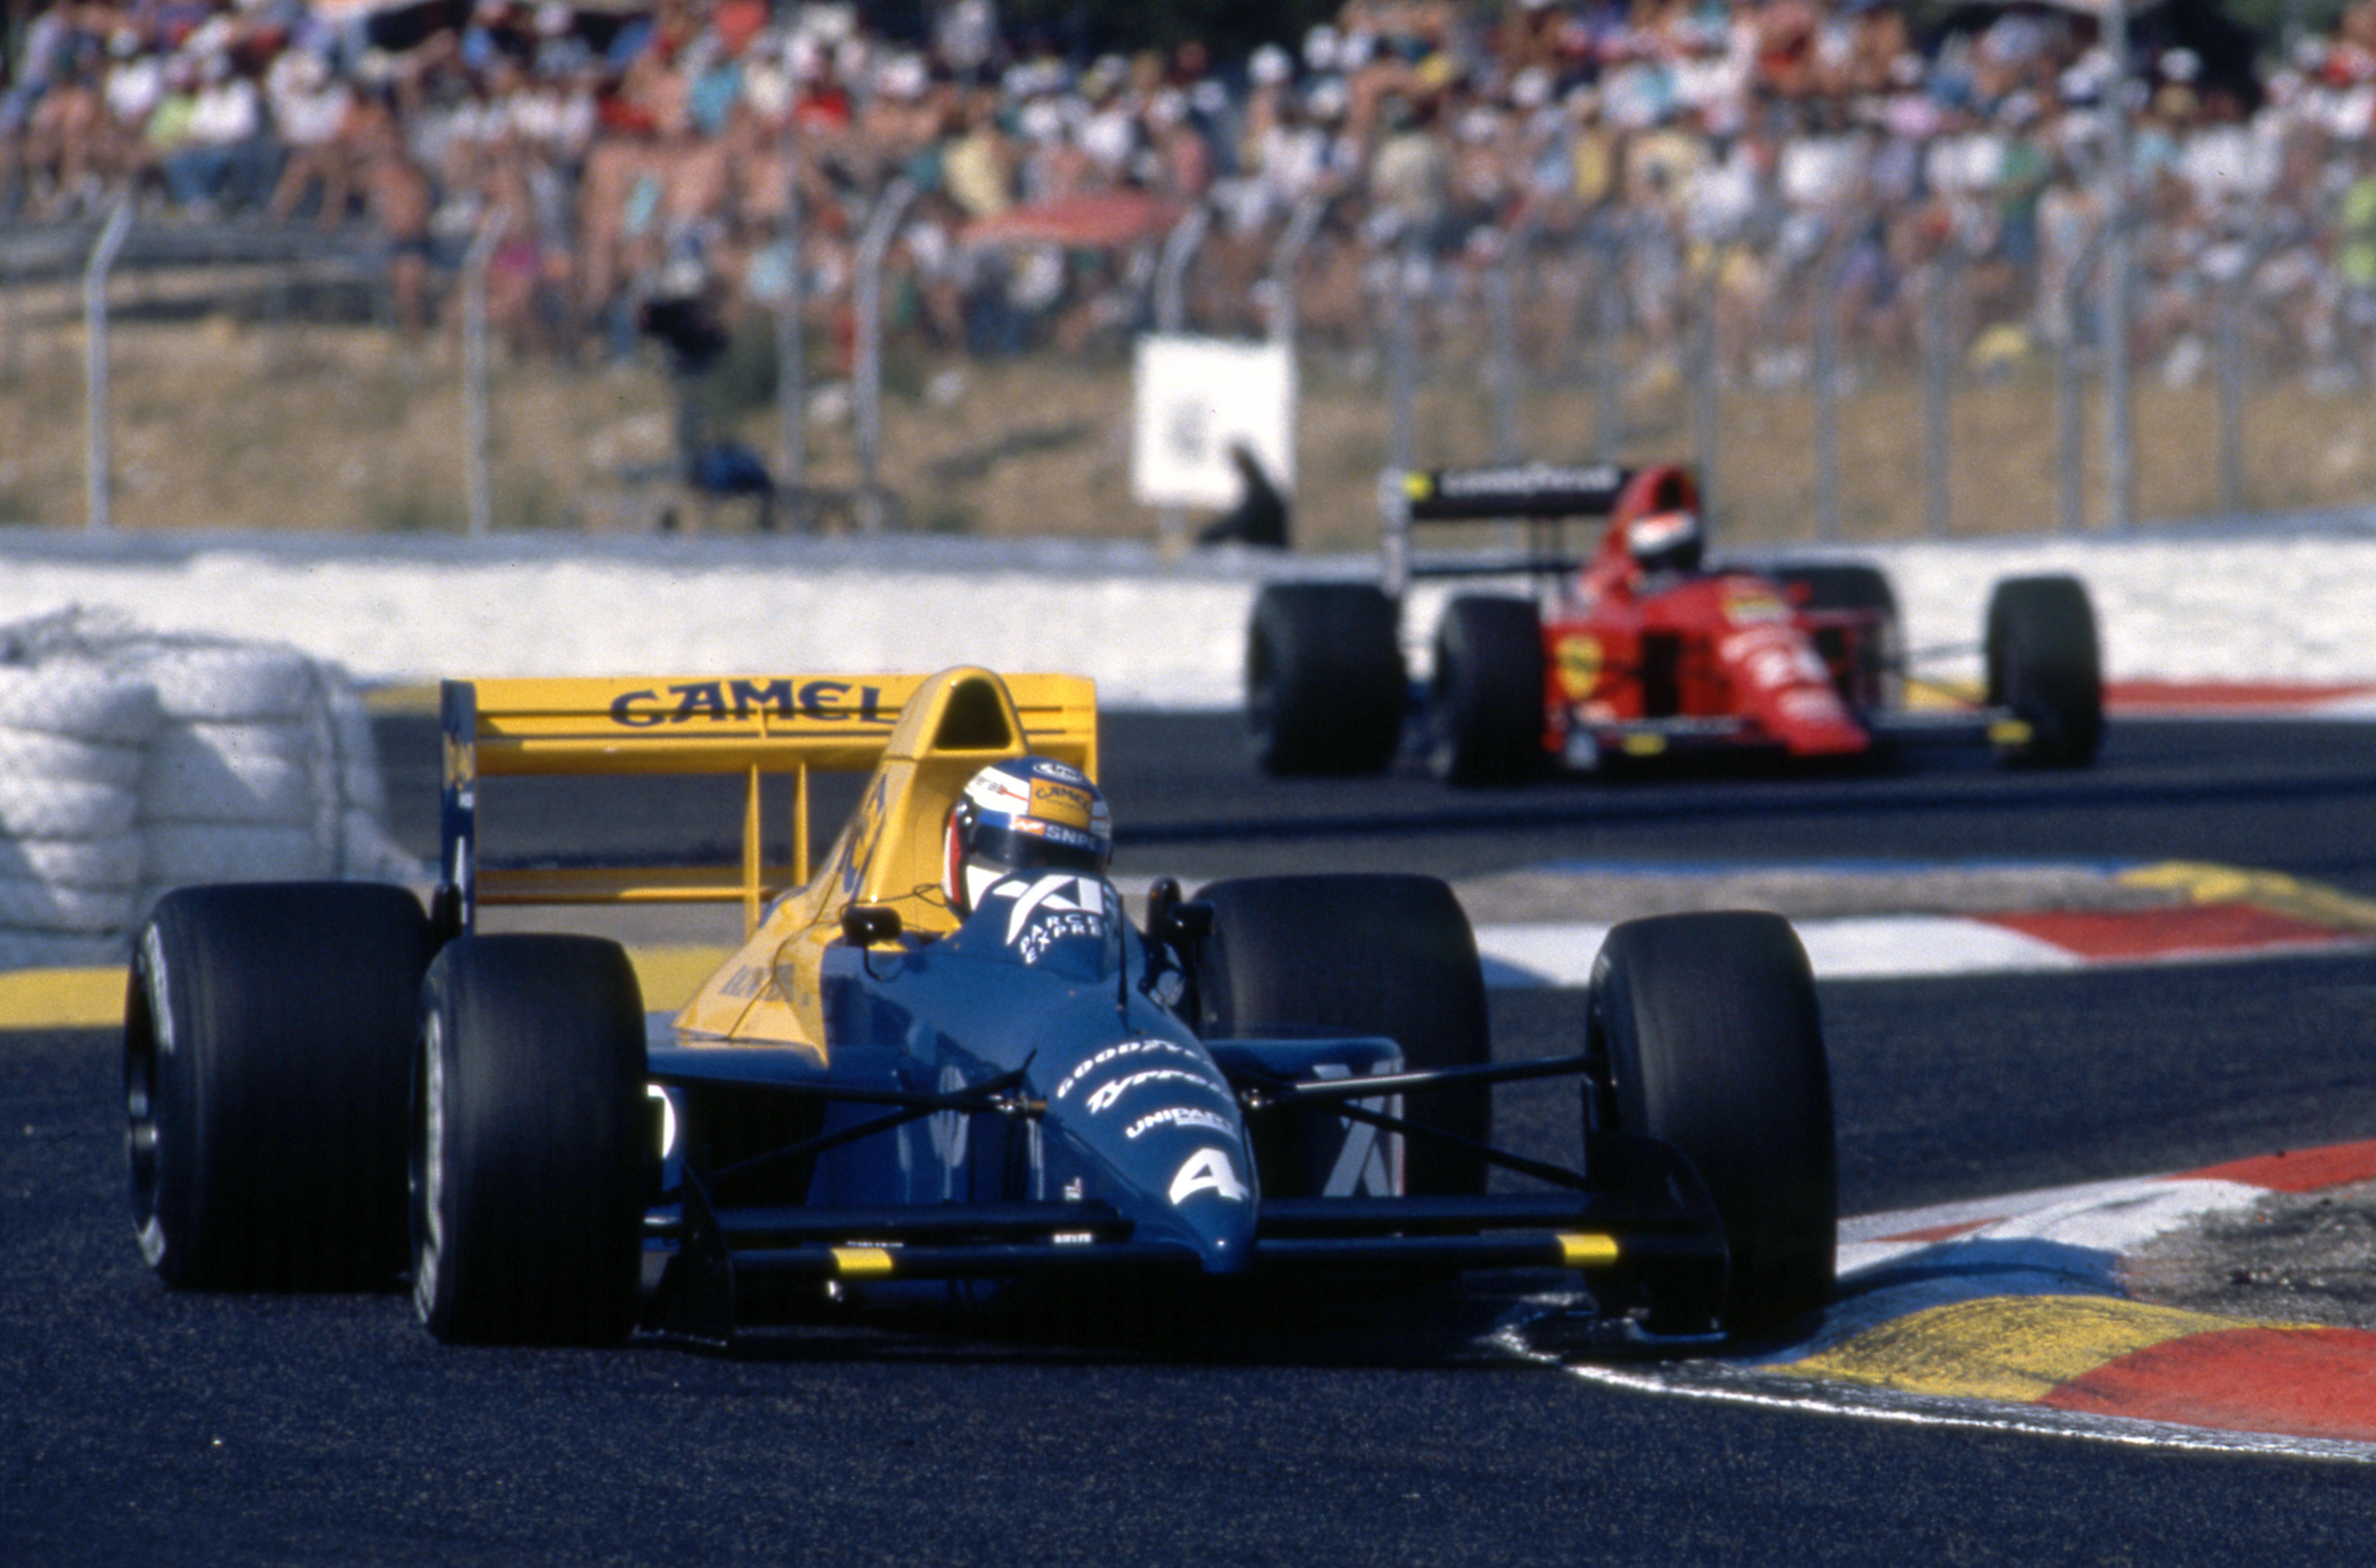 French Grand Prix Paul Ricard (fra) 07 09 7 1989